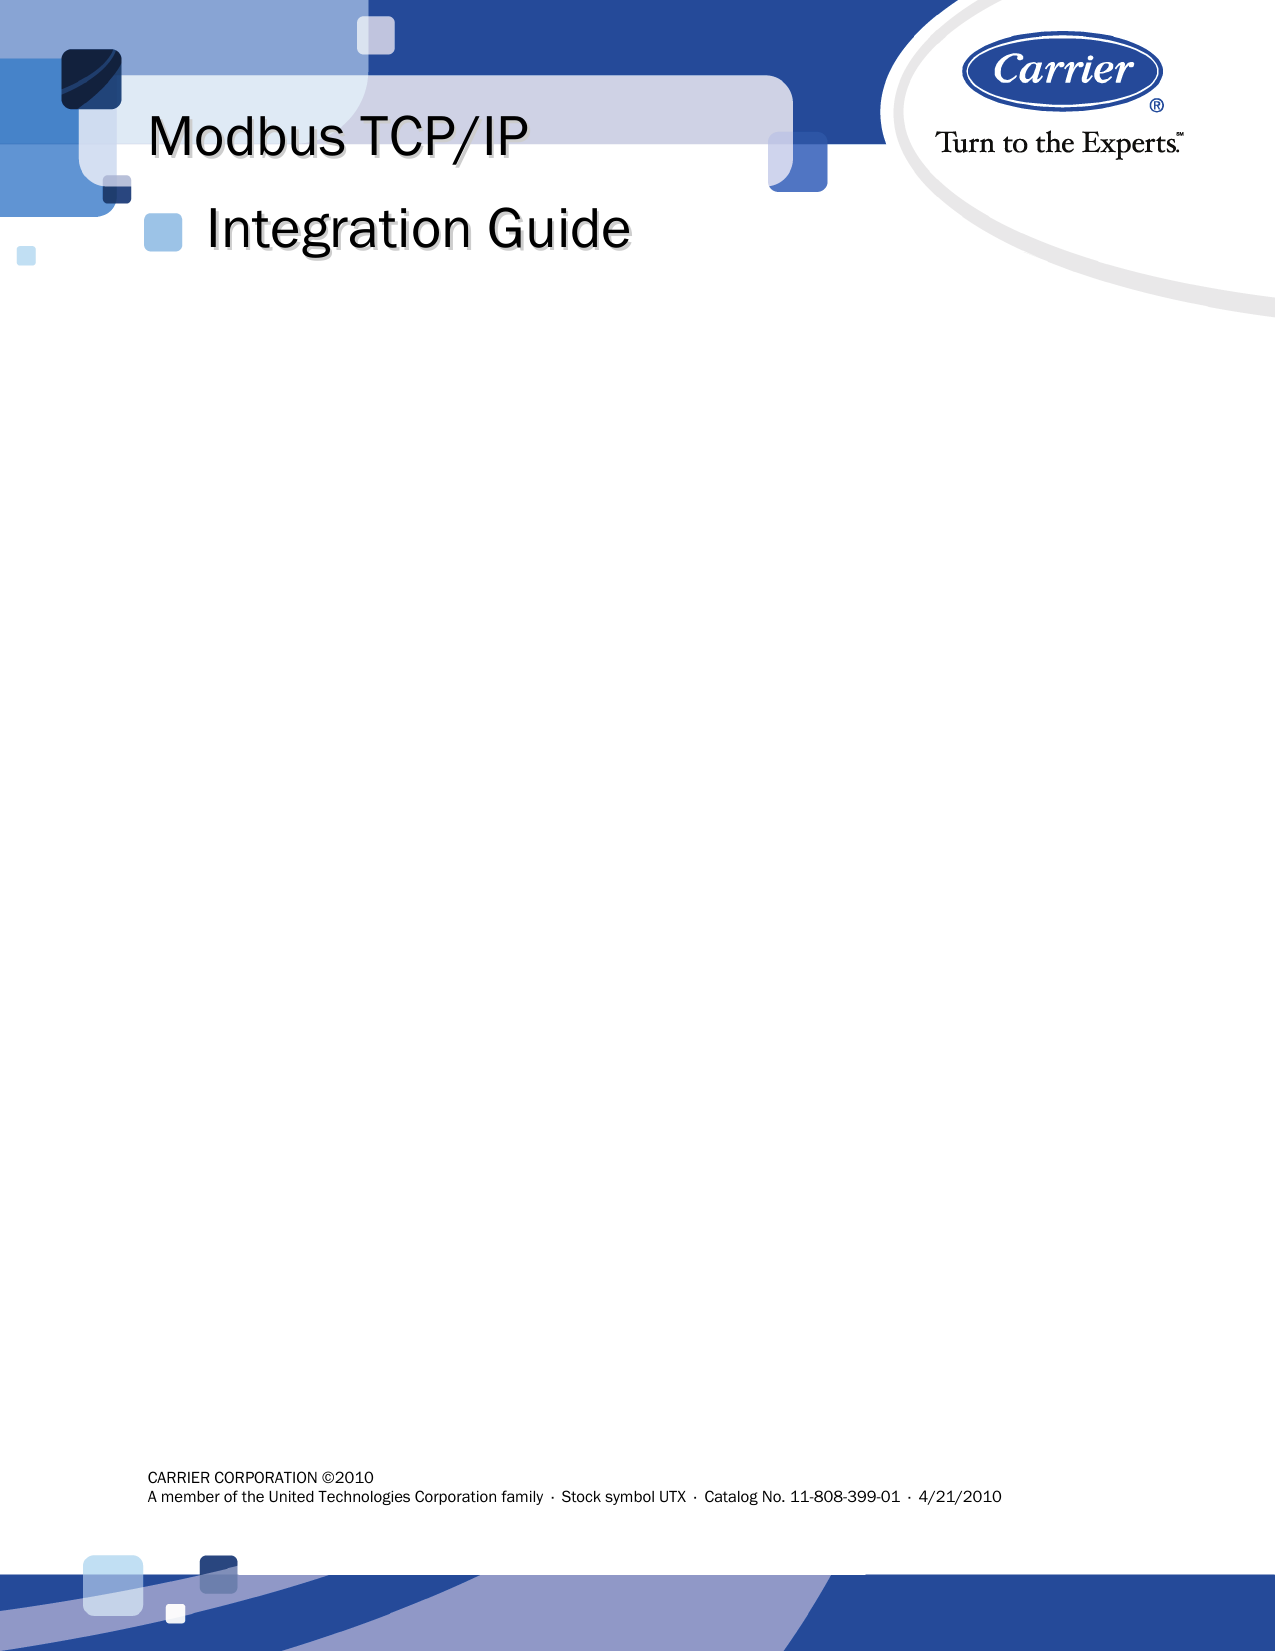 Modbus TCP/IP Integration Guide